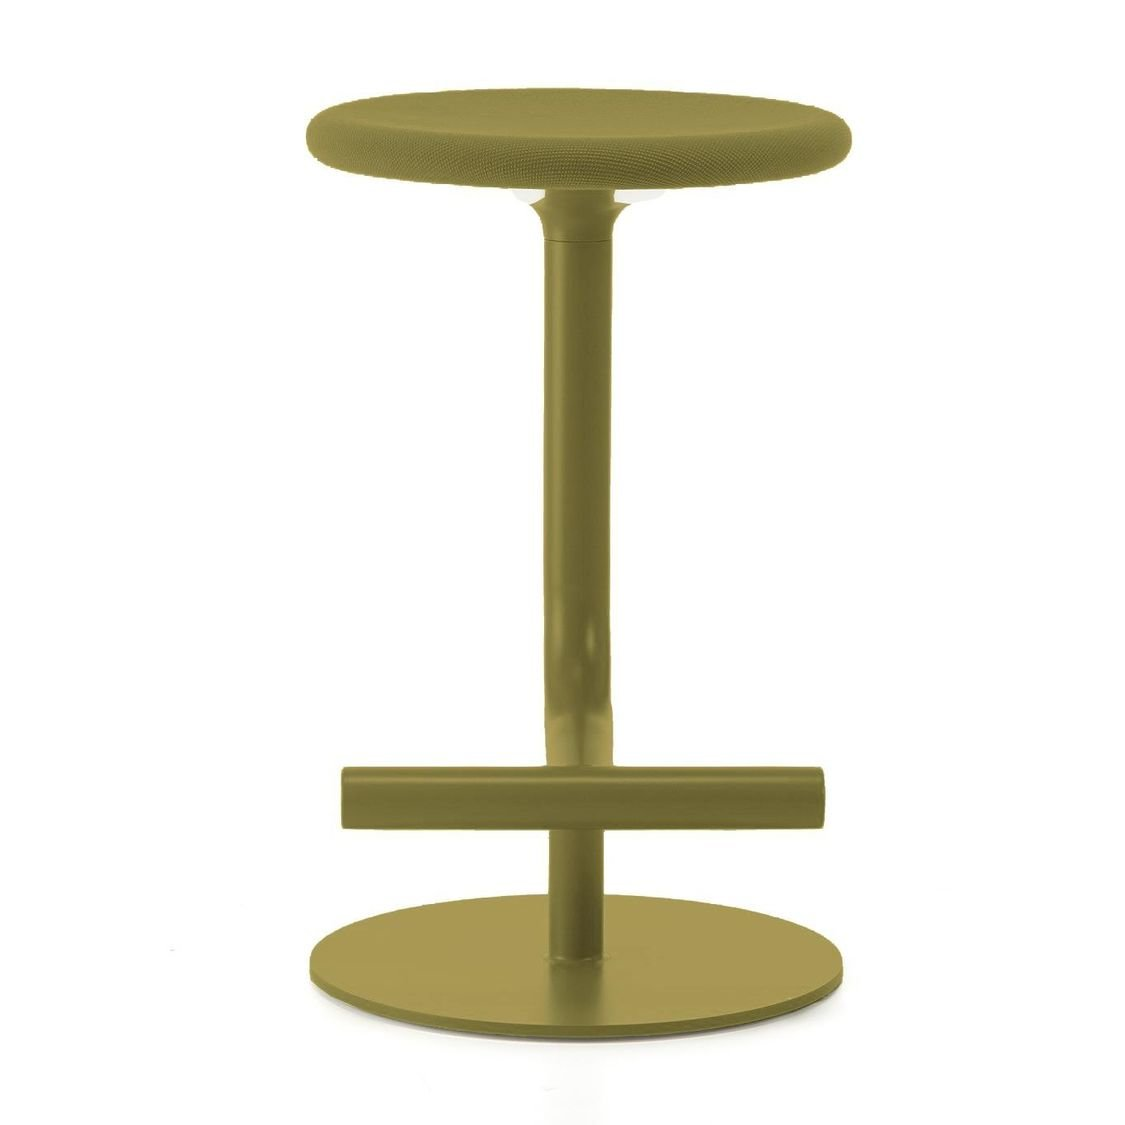 magis tibu tabouret de bar capitonn 60 70cm ambientedirect. Black Bedroom Furniture Sets. Home Design Ideas